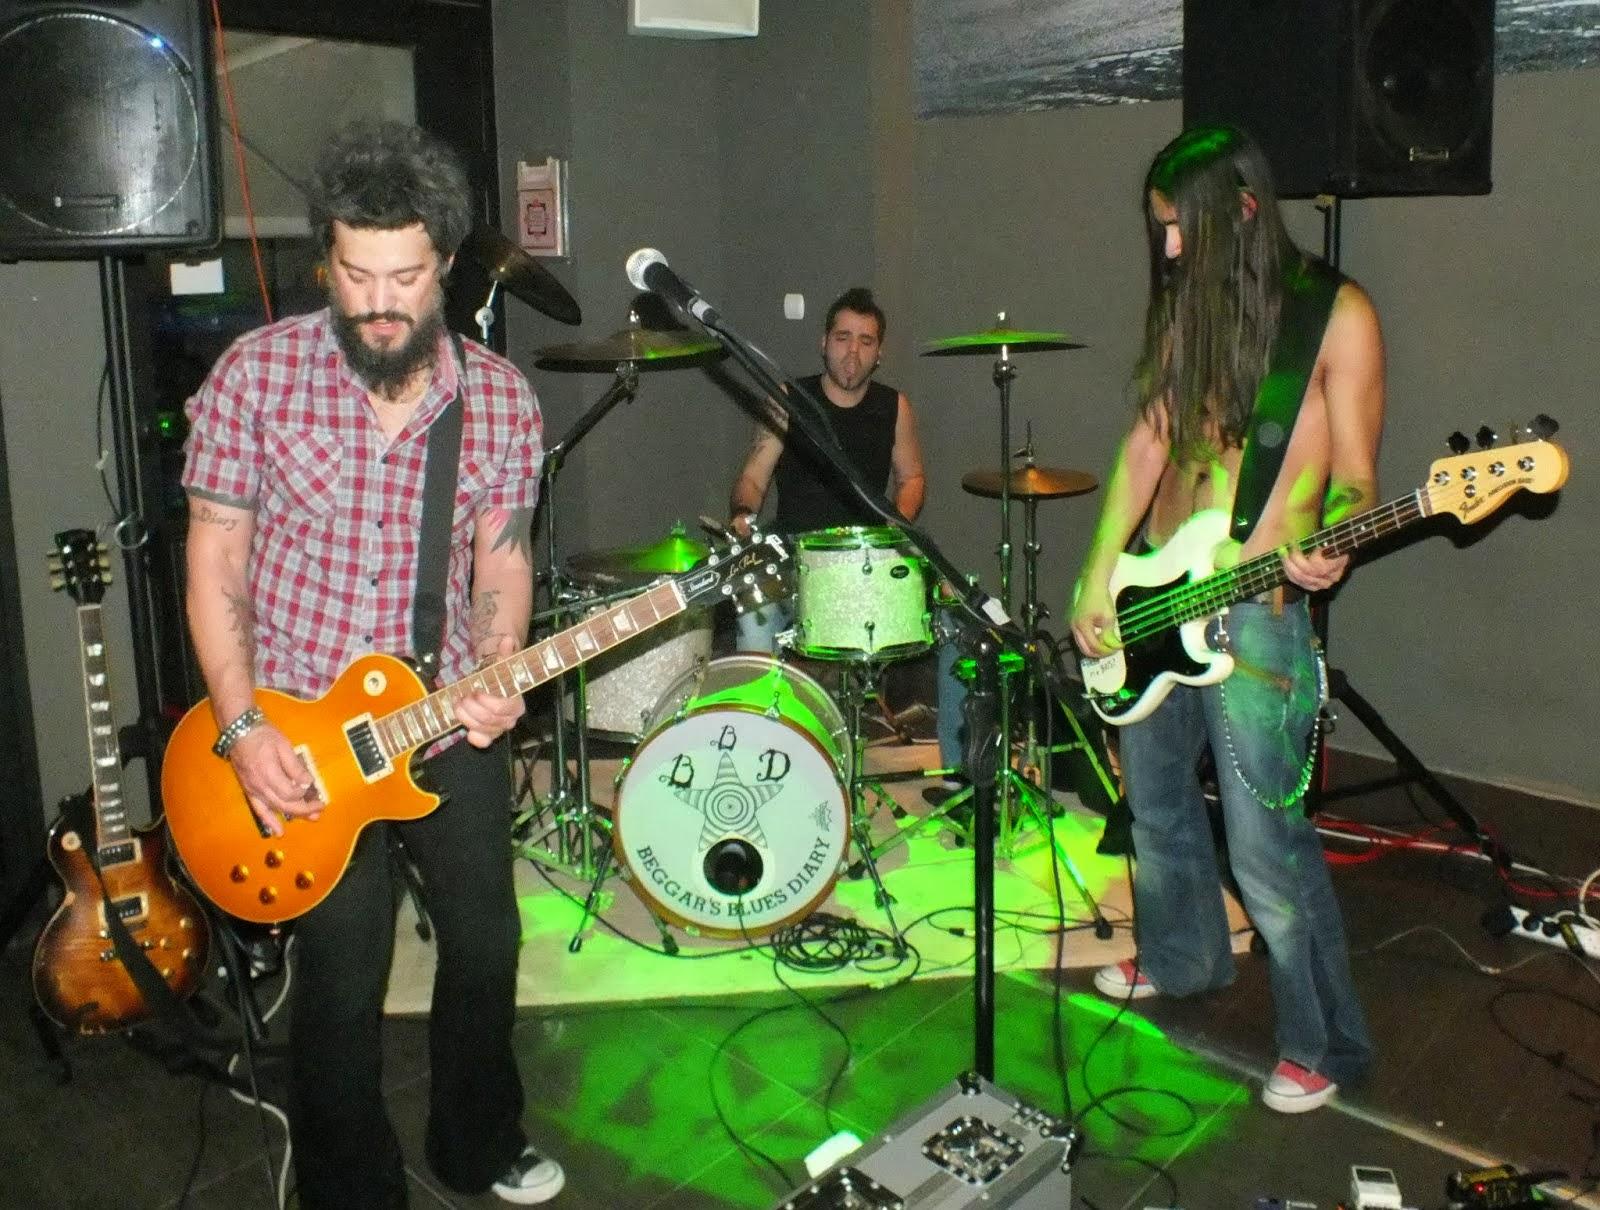 Roadhouse Blues Club Καποδιστρίου  83  Ιτέα